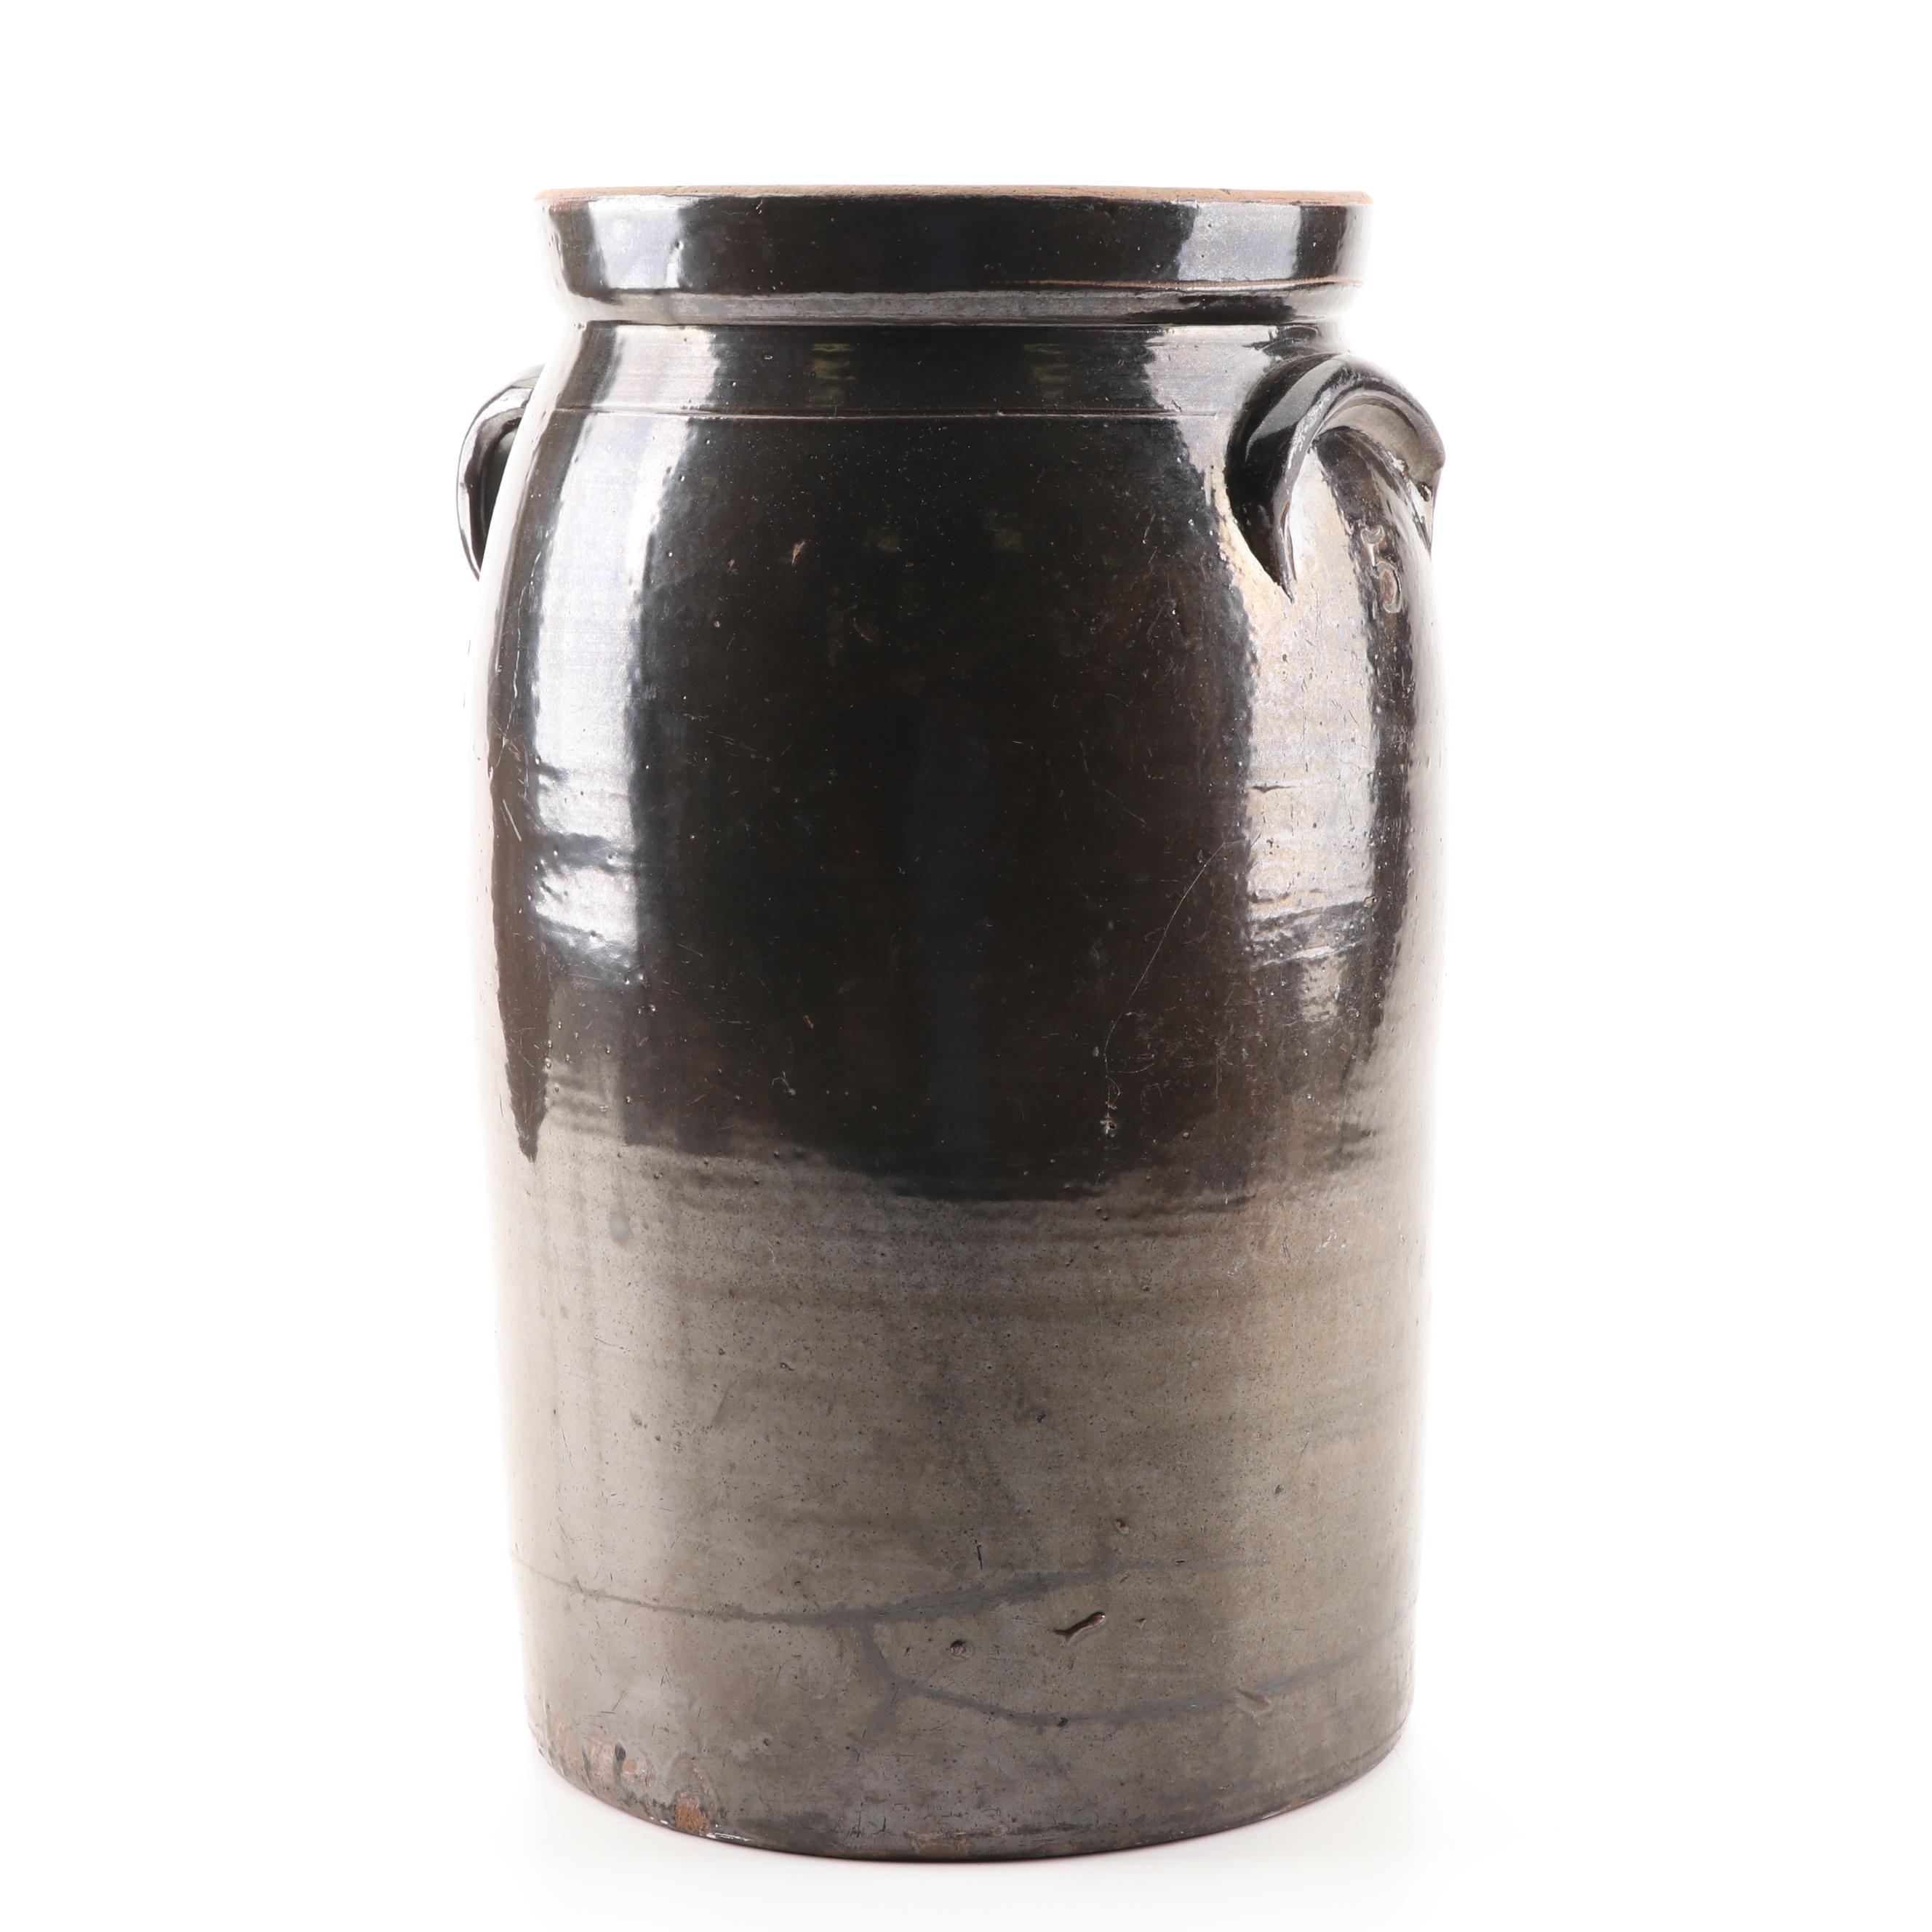 Albany Slip Glazed Five-Gallon Stoneware Crock with Double Handles